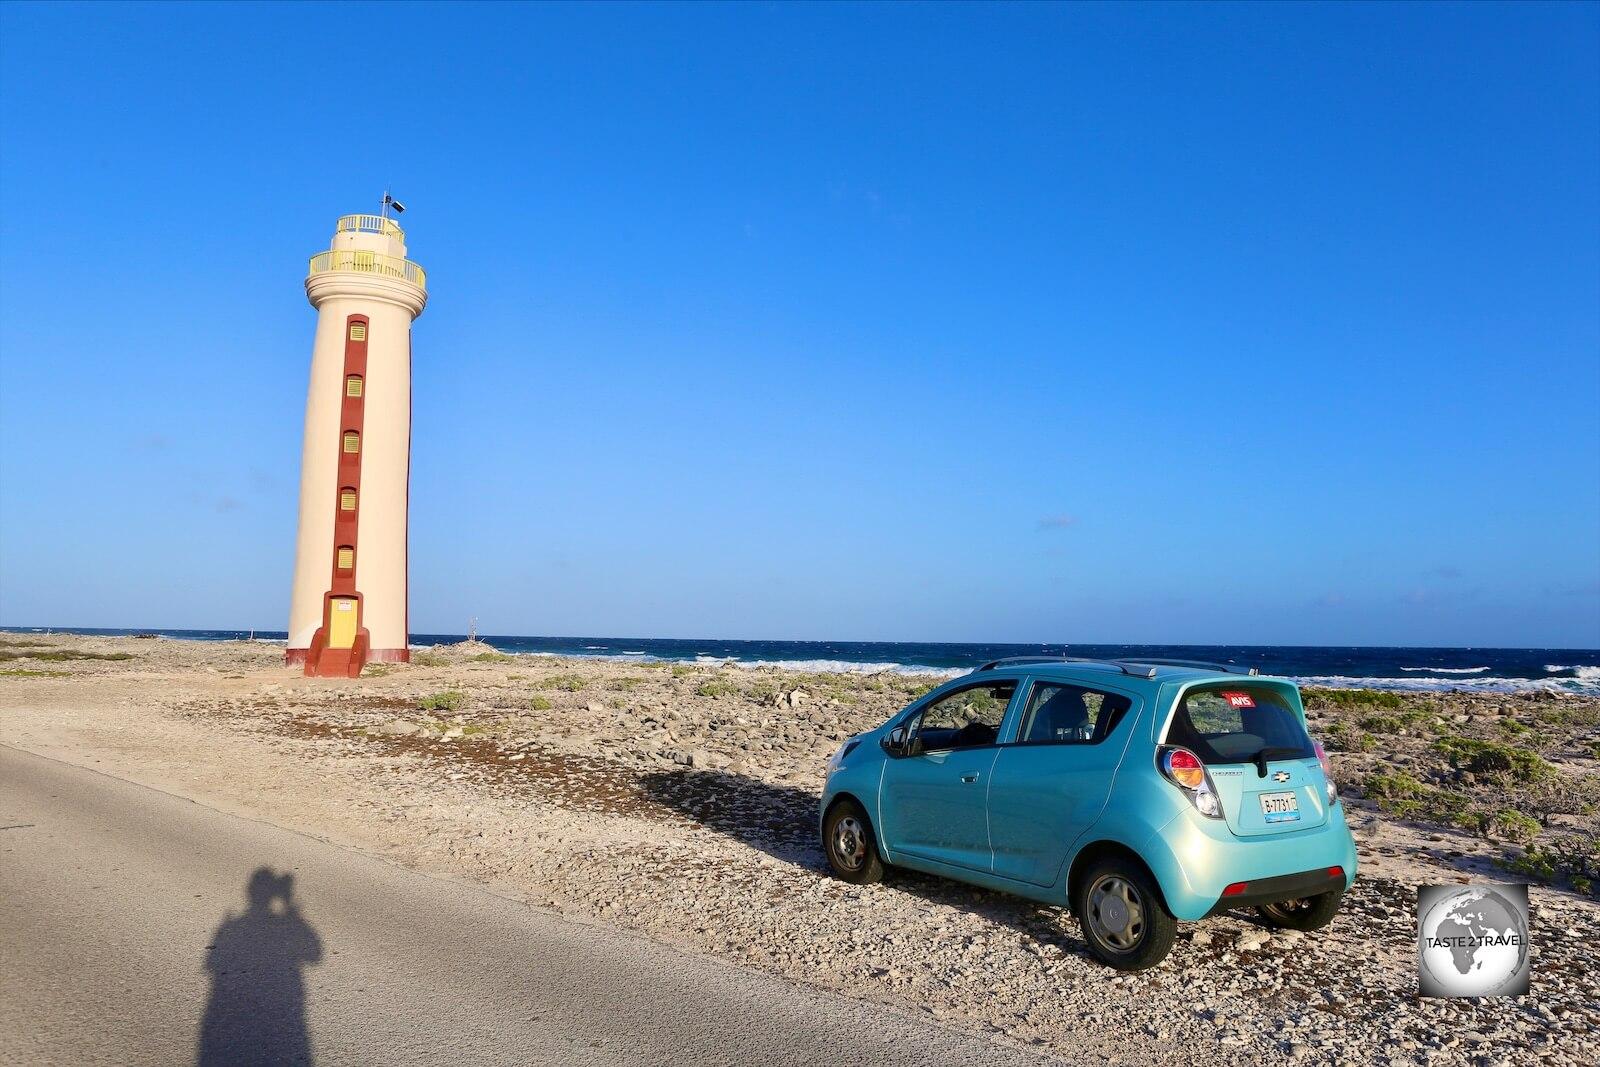 Willemstoren Lighthouse, Bonaire.